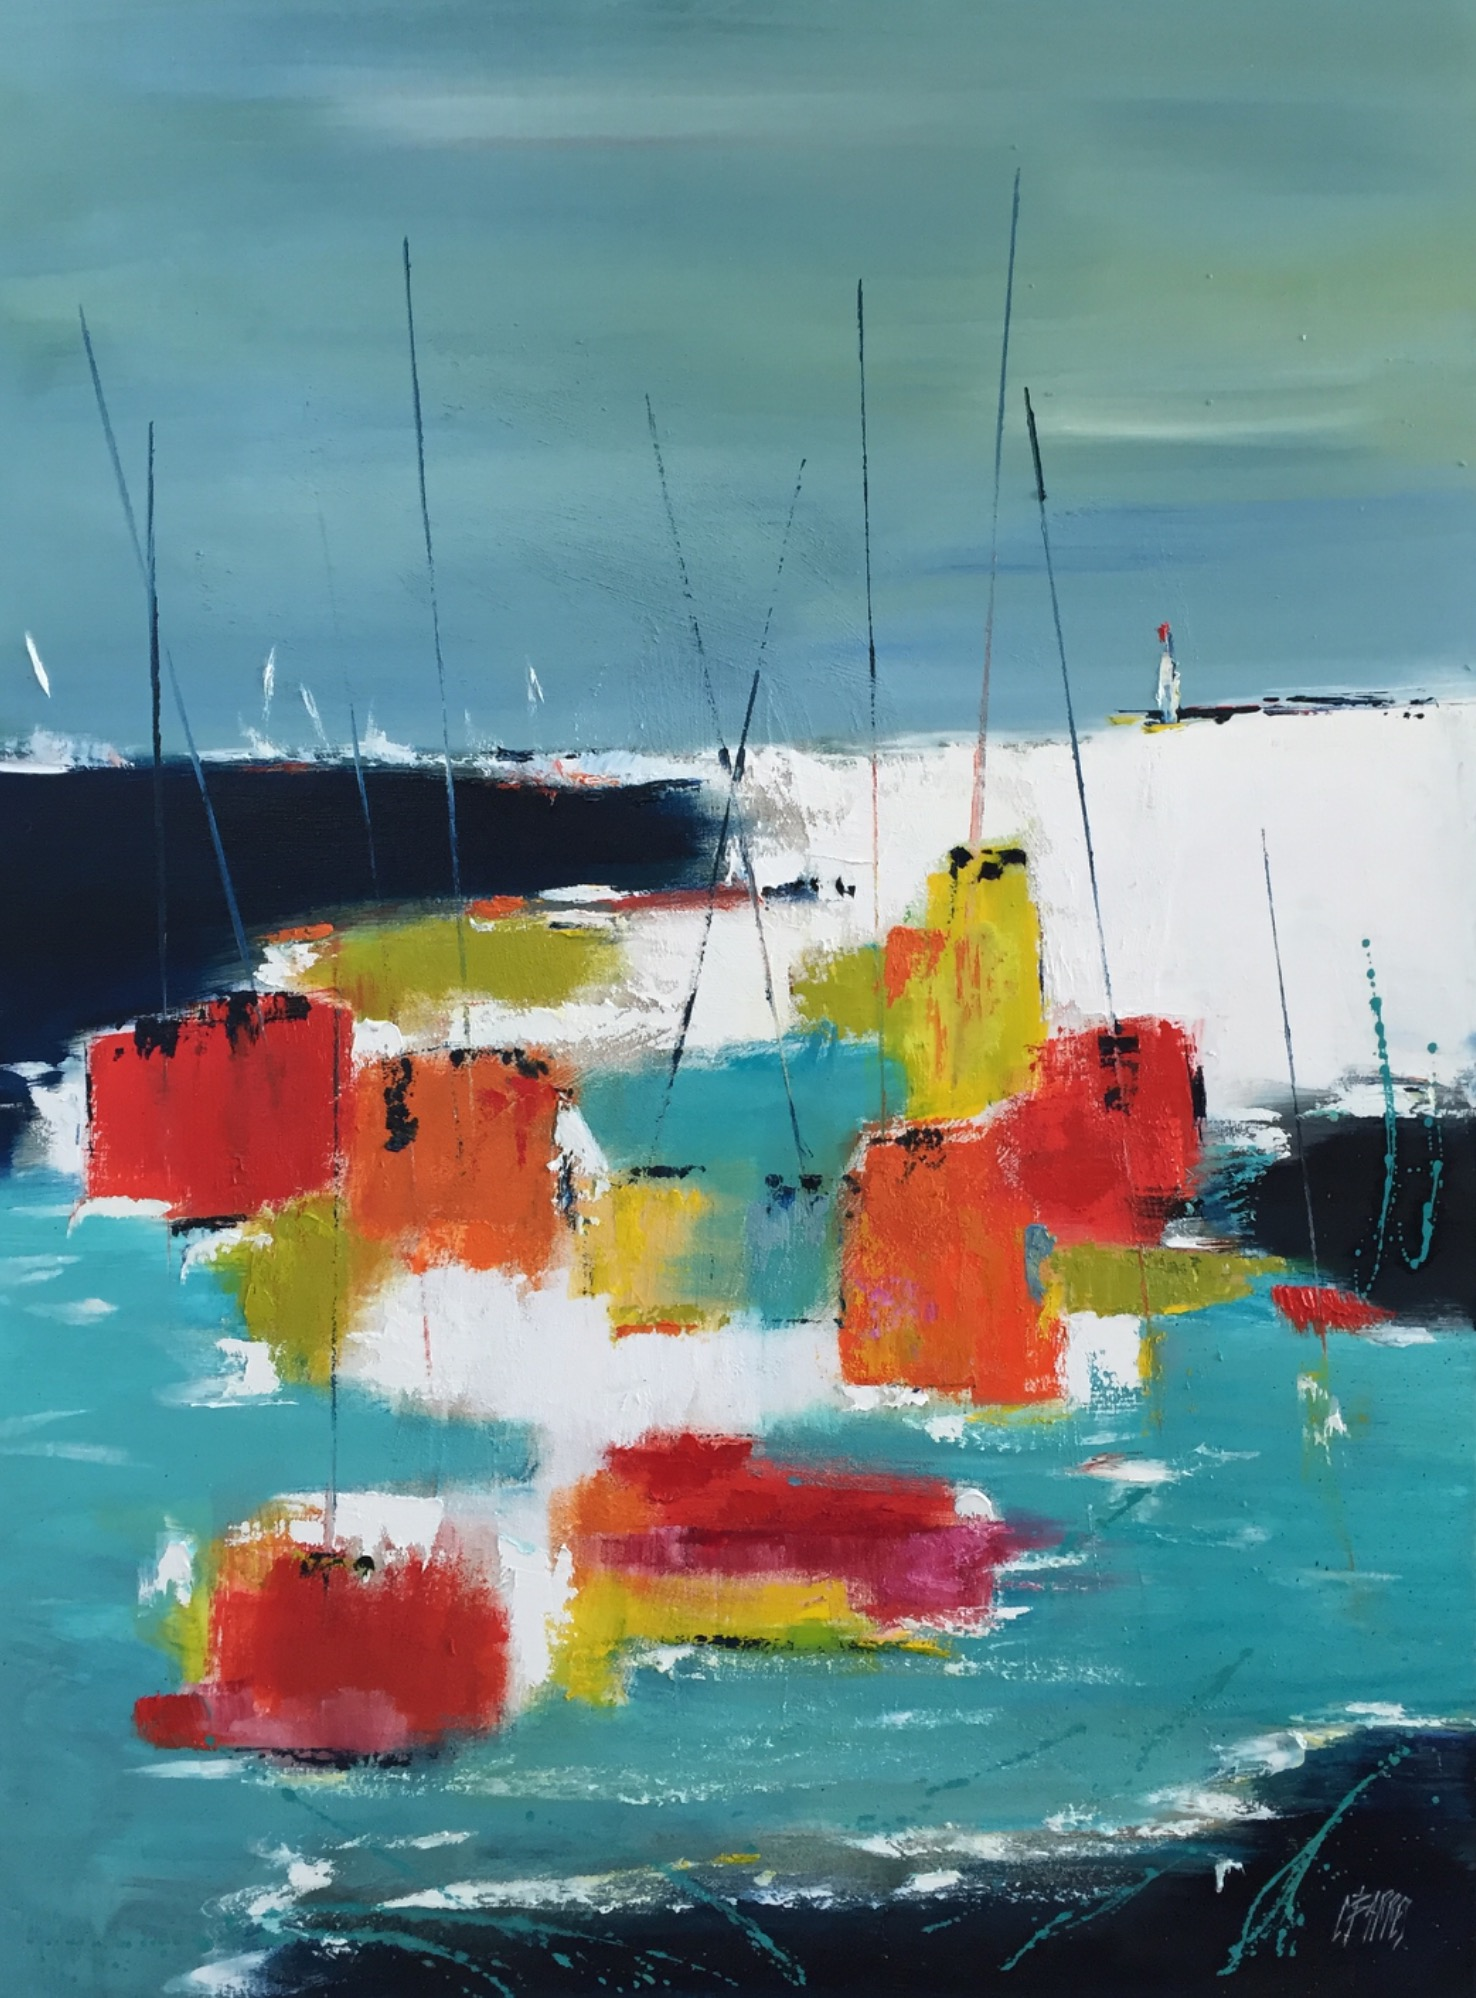 Tableau voiliers série marine